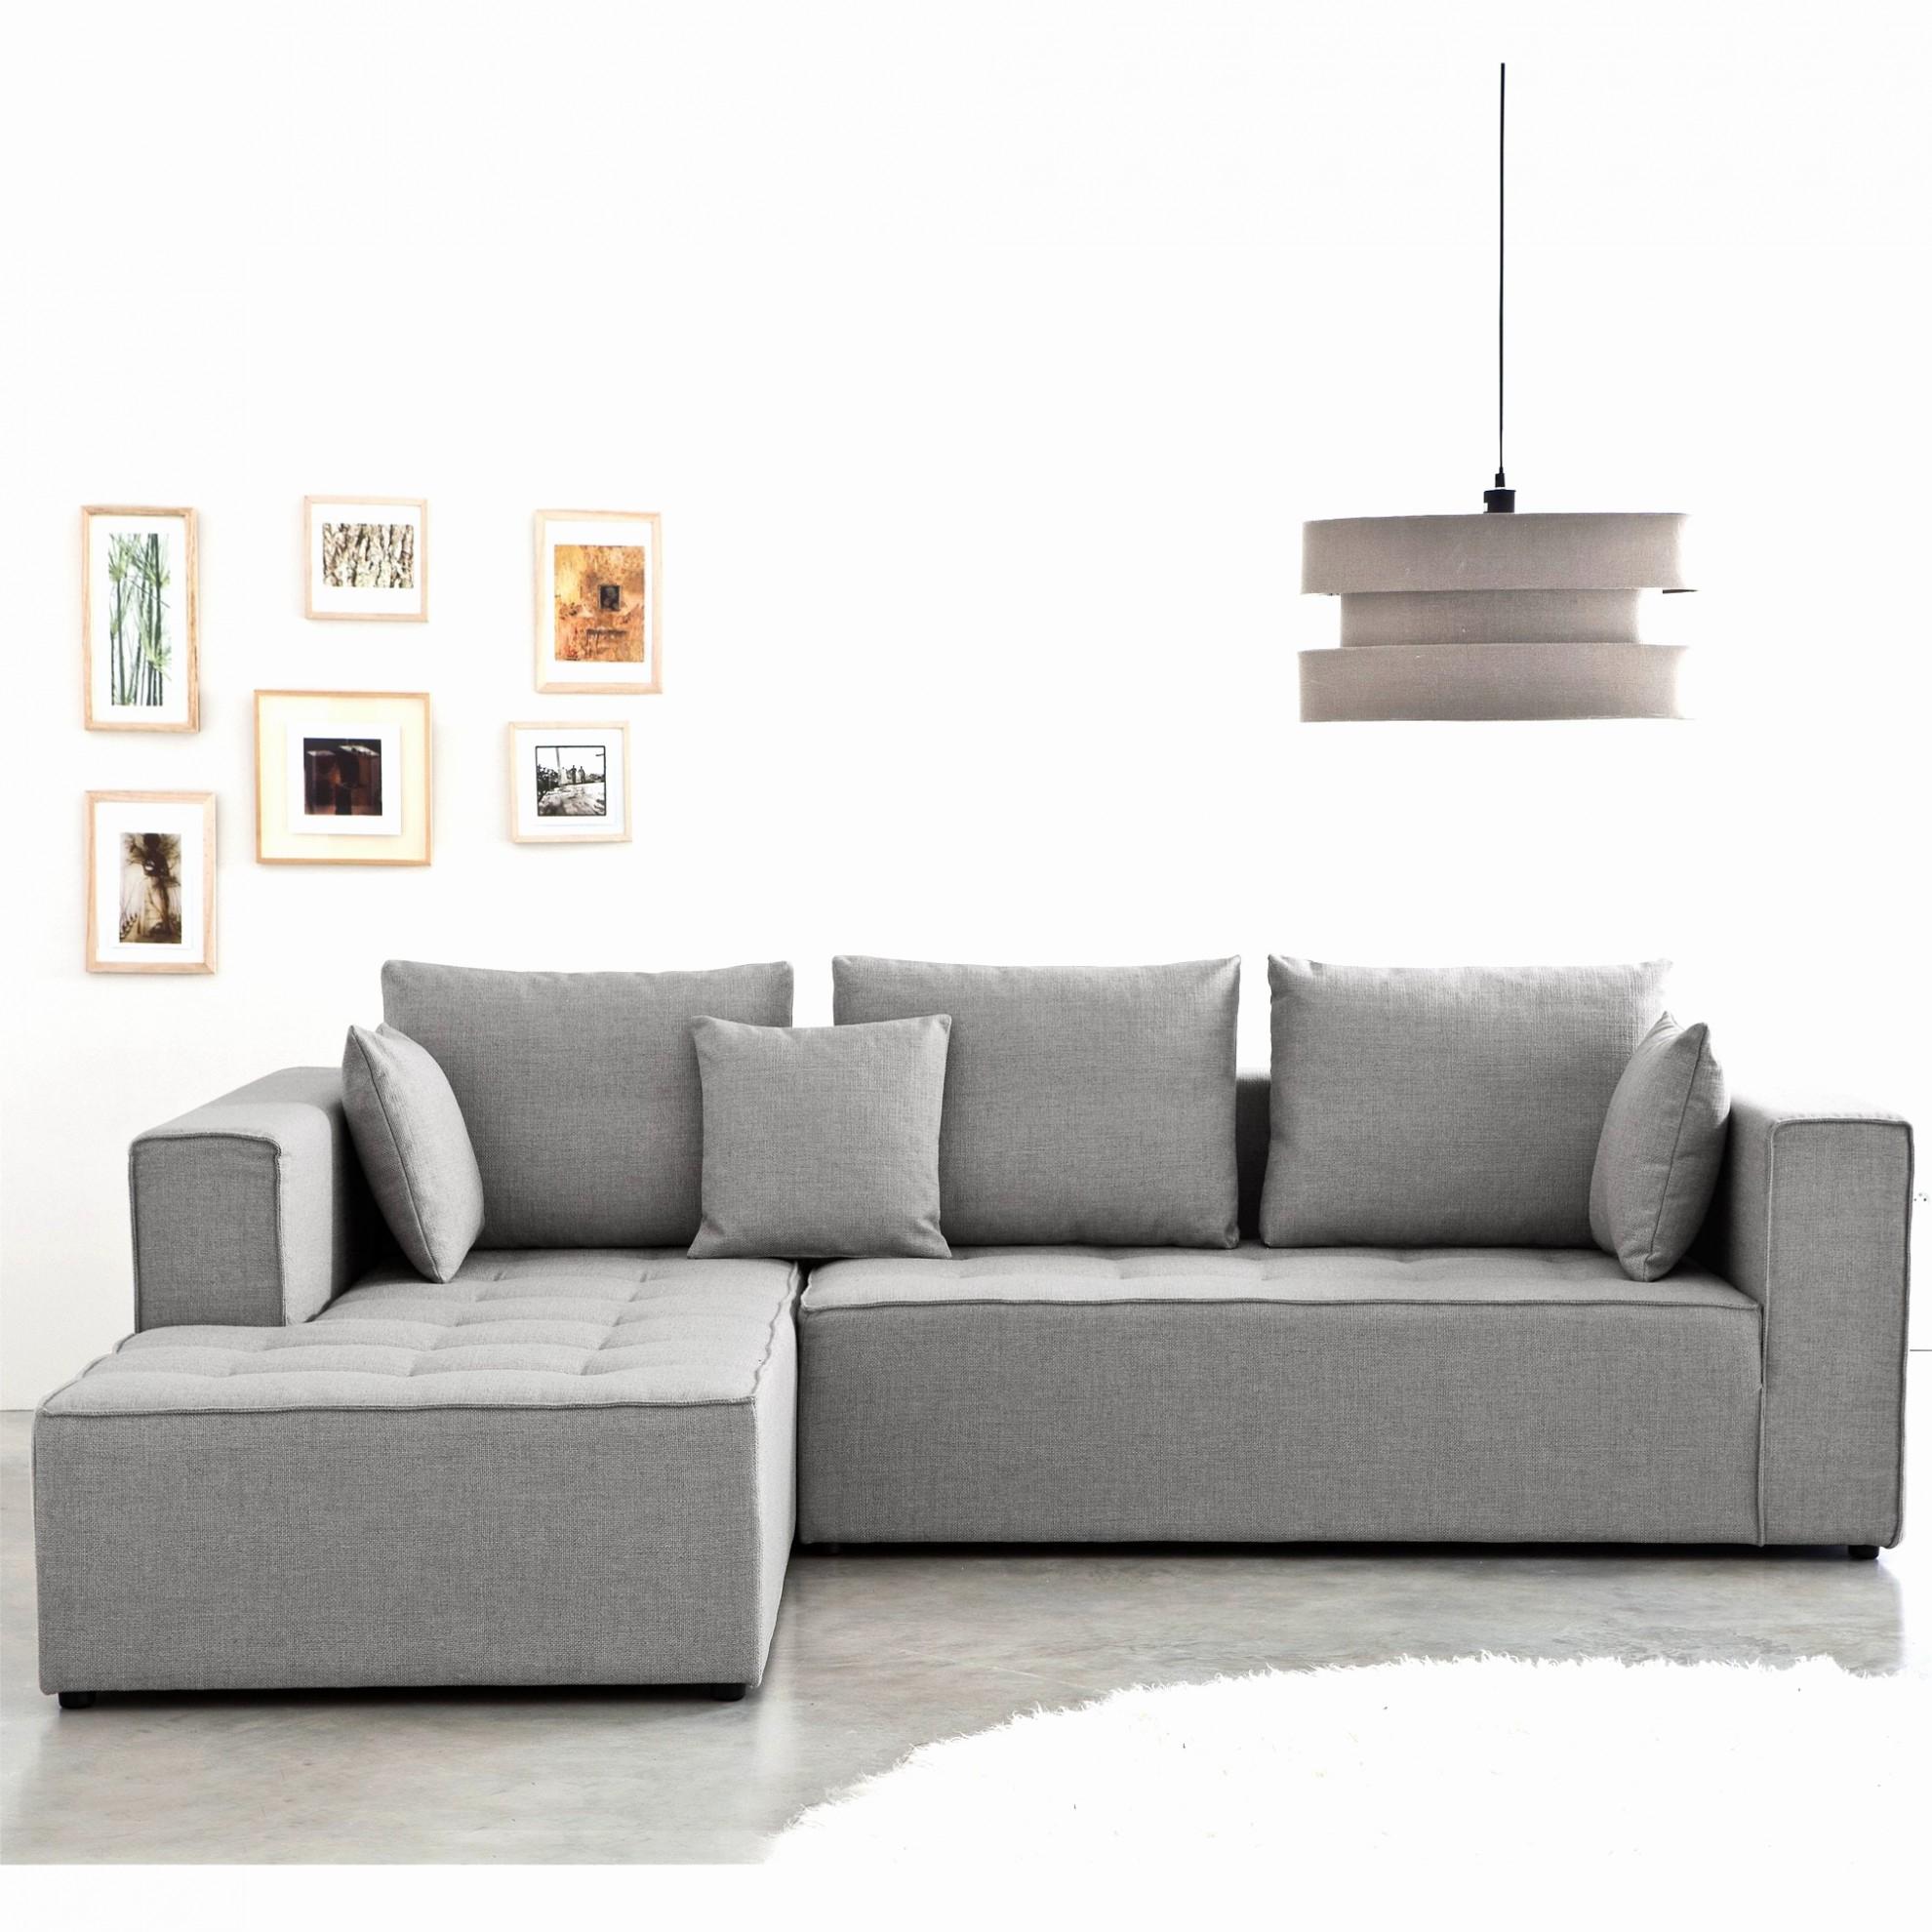 ikea canap convertible friheten impressionnant collection. Black Bedroom Furniture Sets. Home Design Ideas